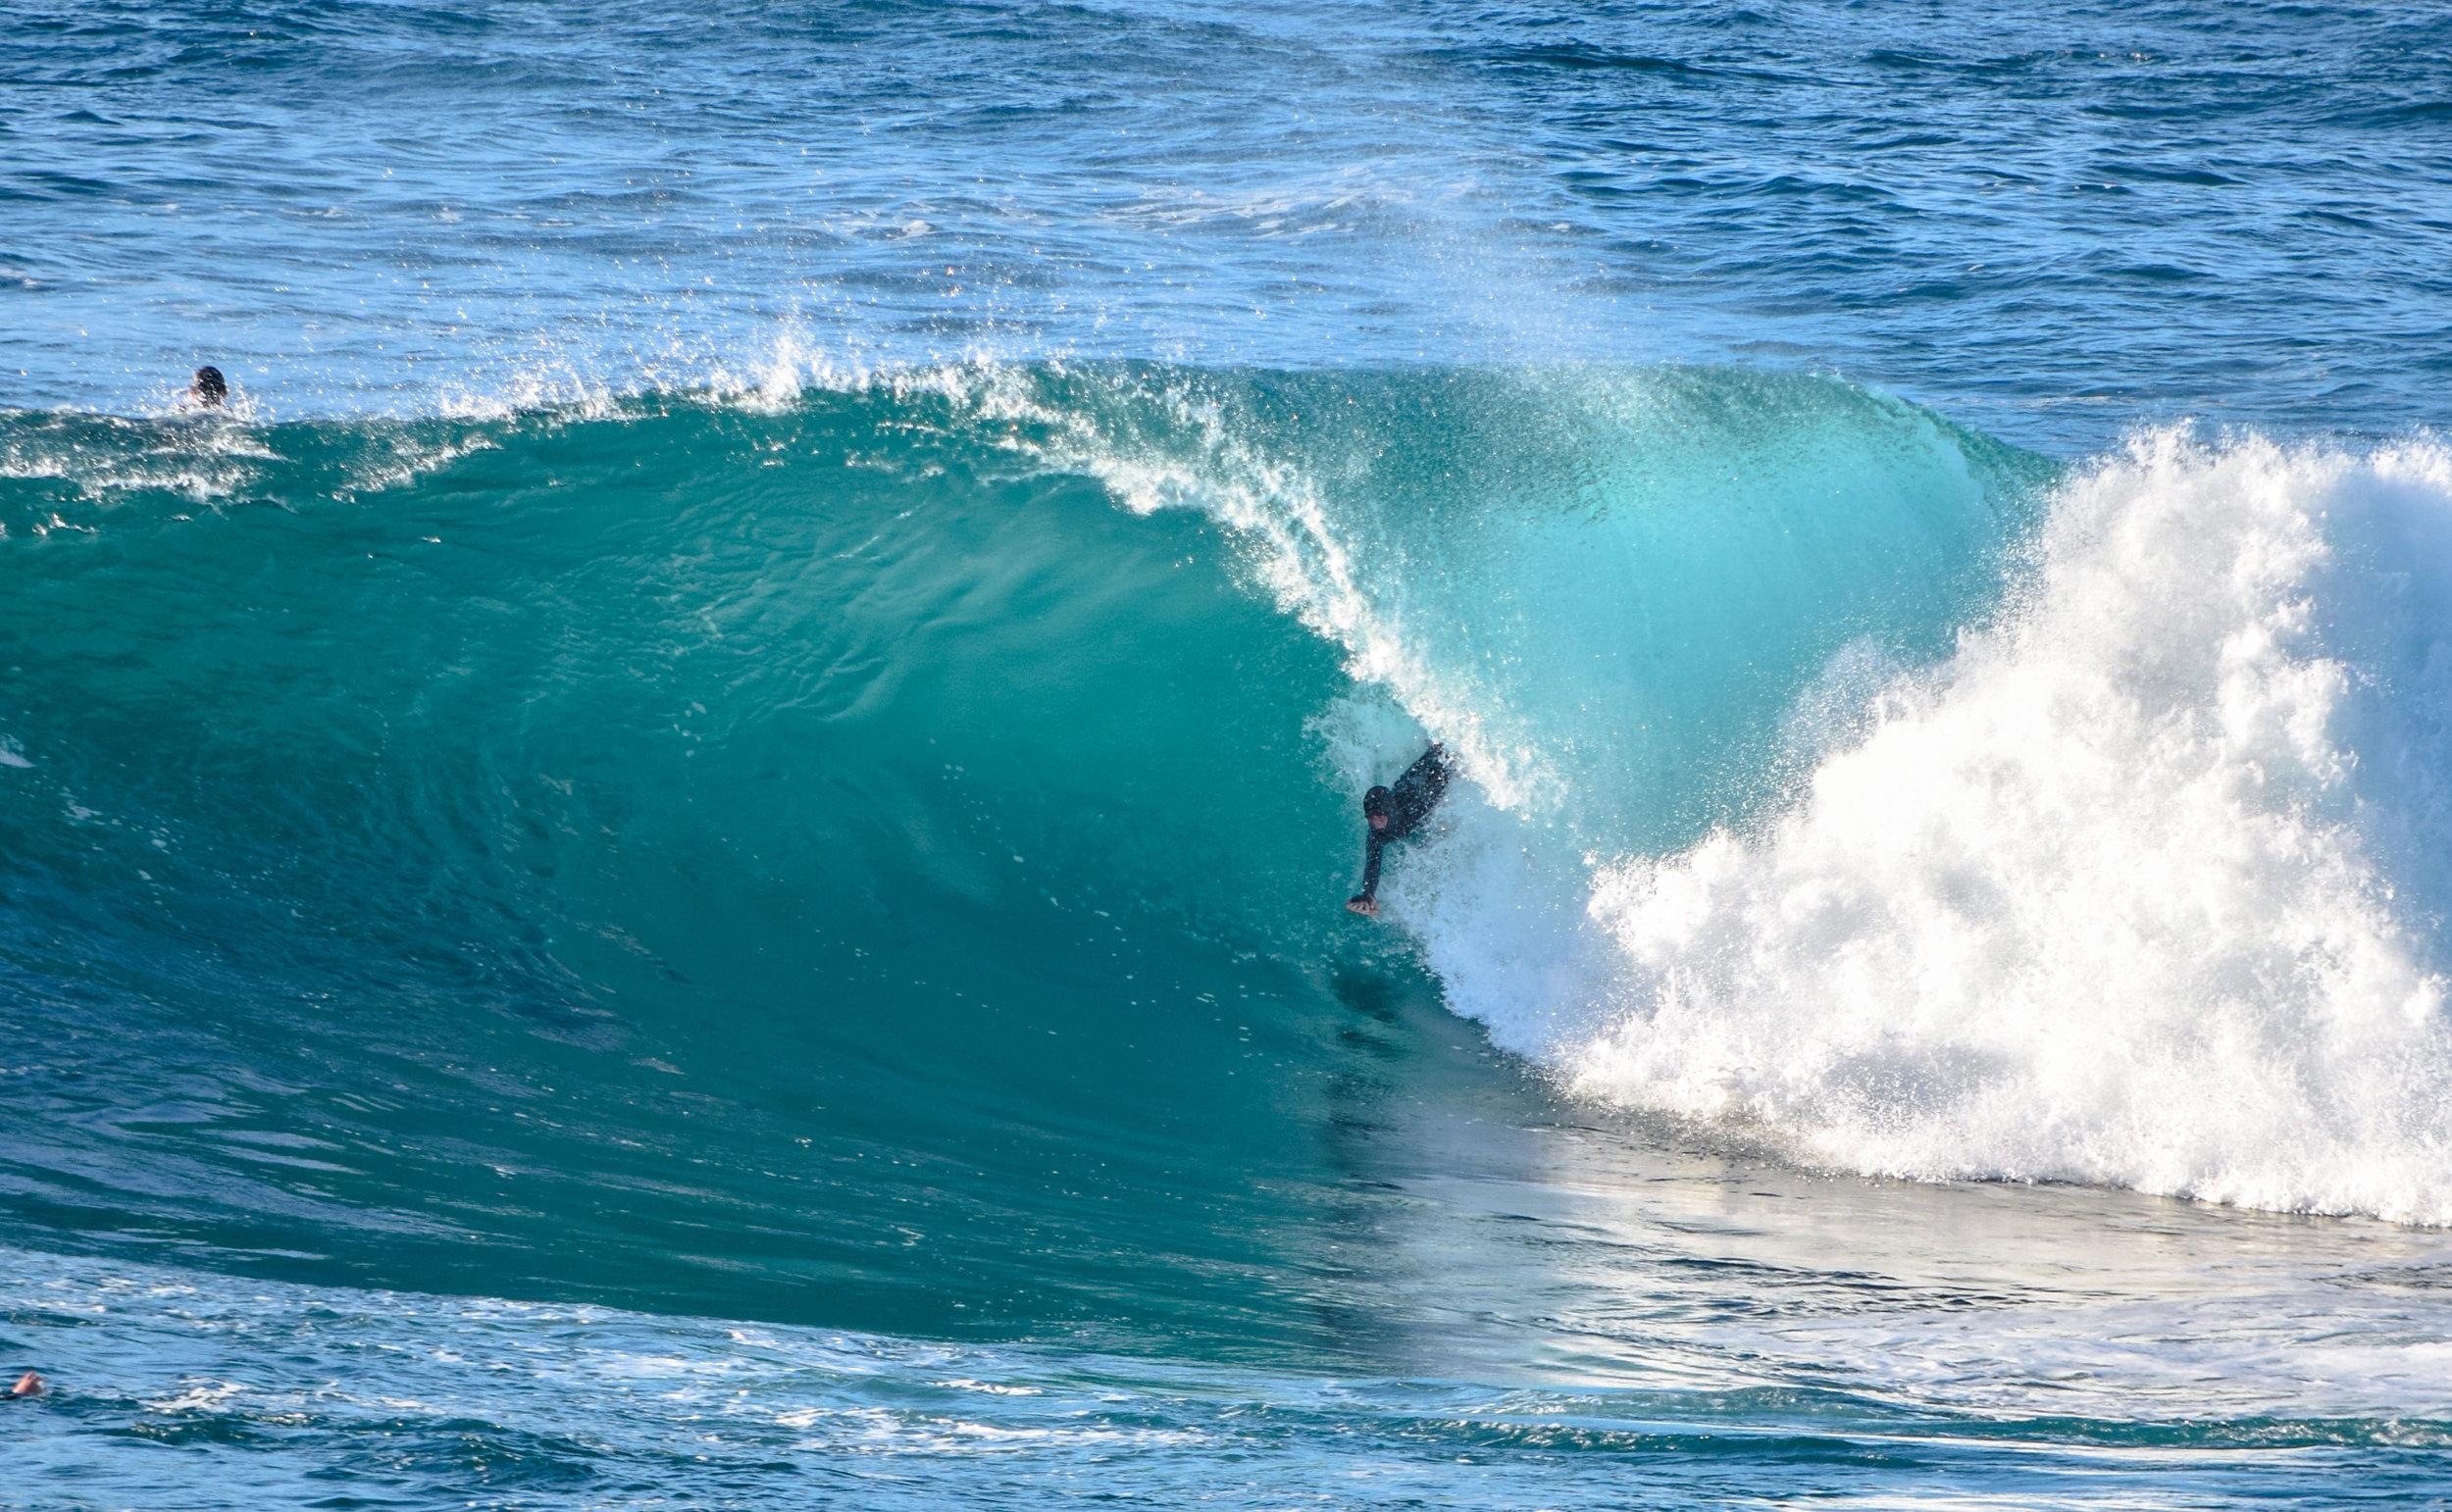 corey sains bodysurfer